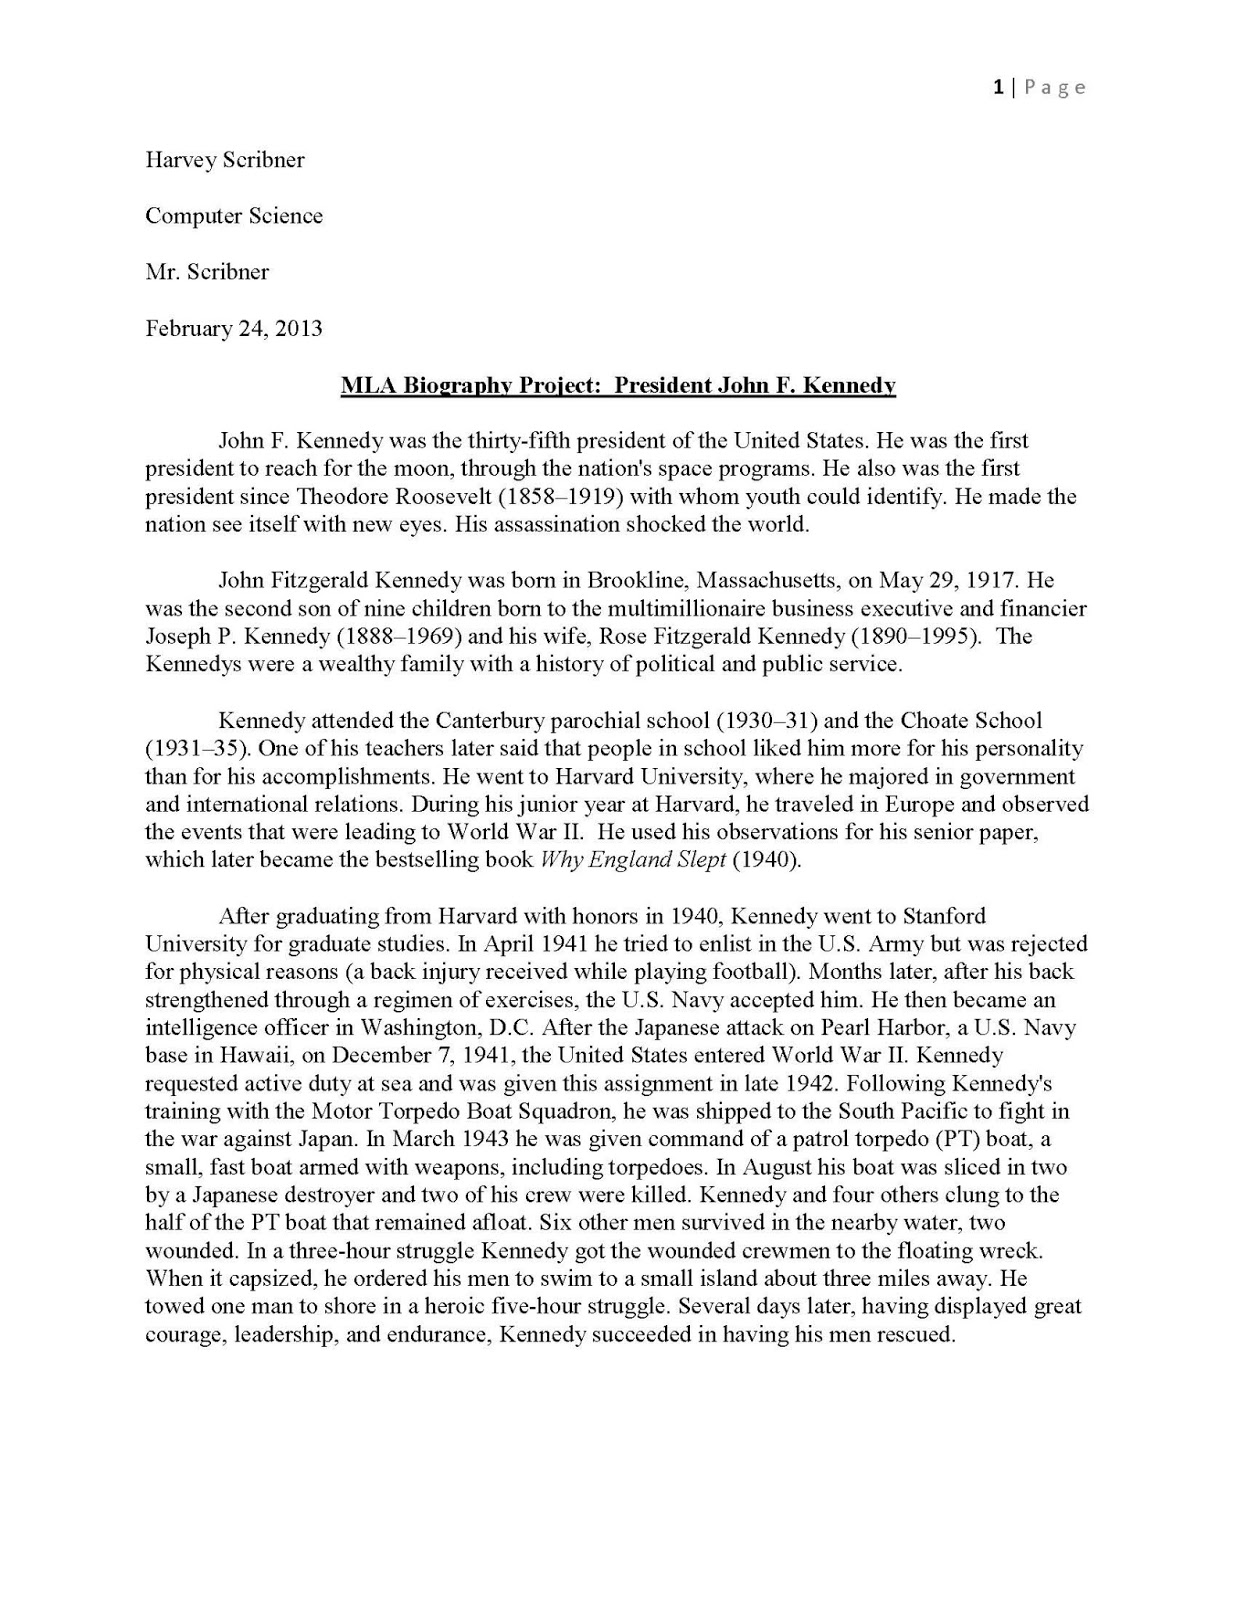 012 Jfkmlashortformbiographyreportexample Page 1 Essay Example Unique Autobiography For Highschool Students Pdf Bibliography Examples Full